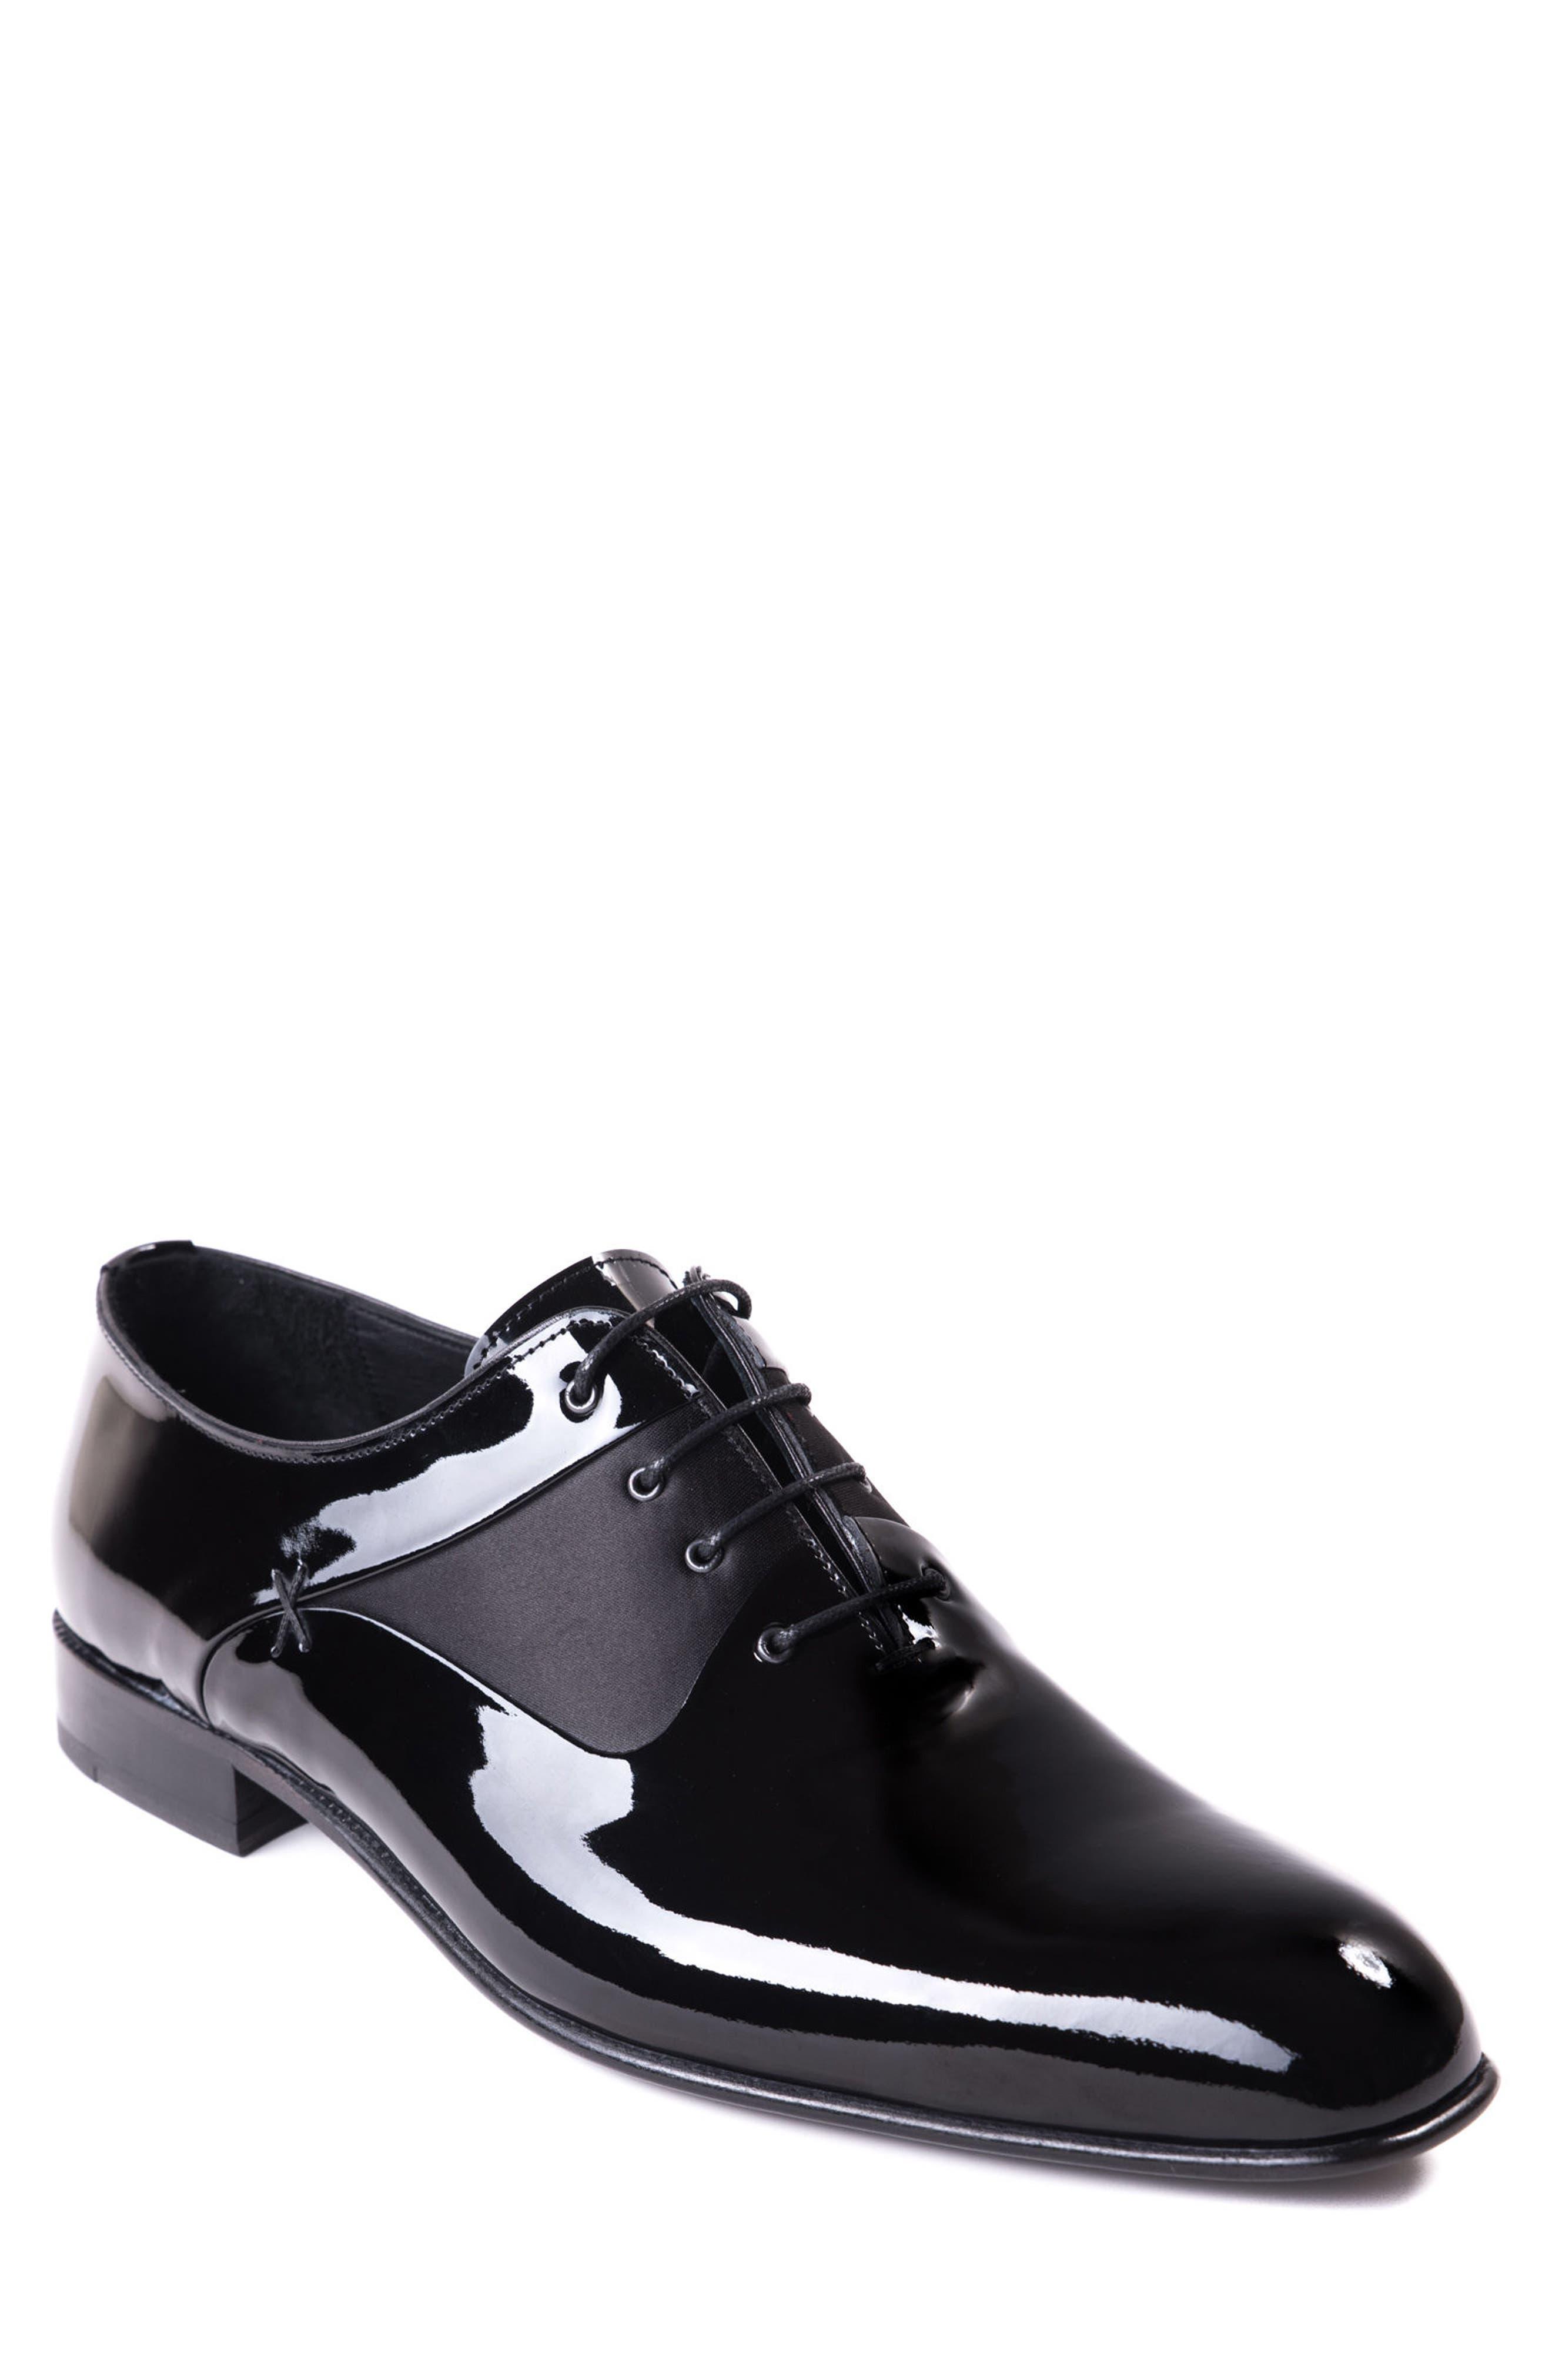 Jared Lang Men's Ricci Plain Toe Oxford CpNyIVLCO